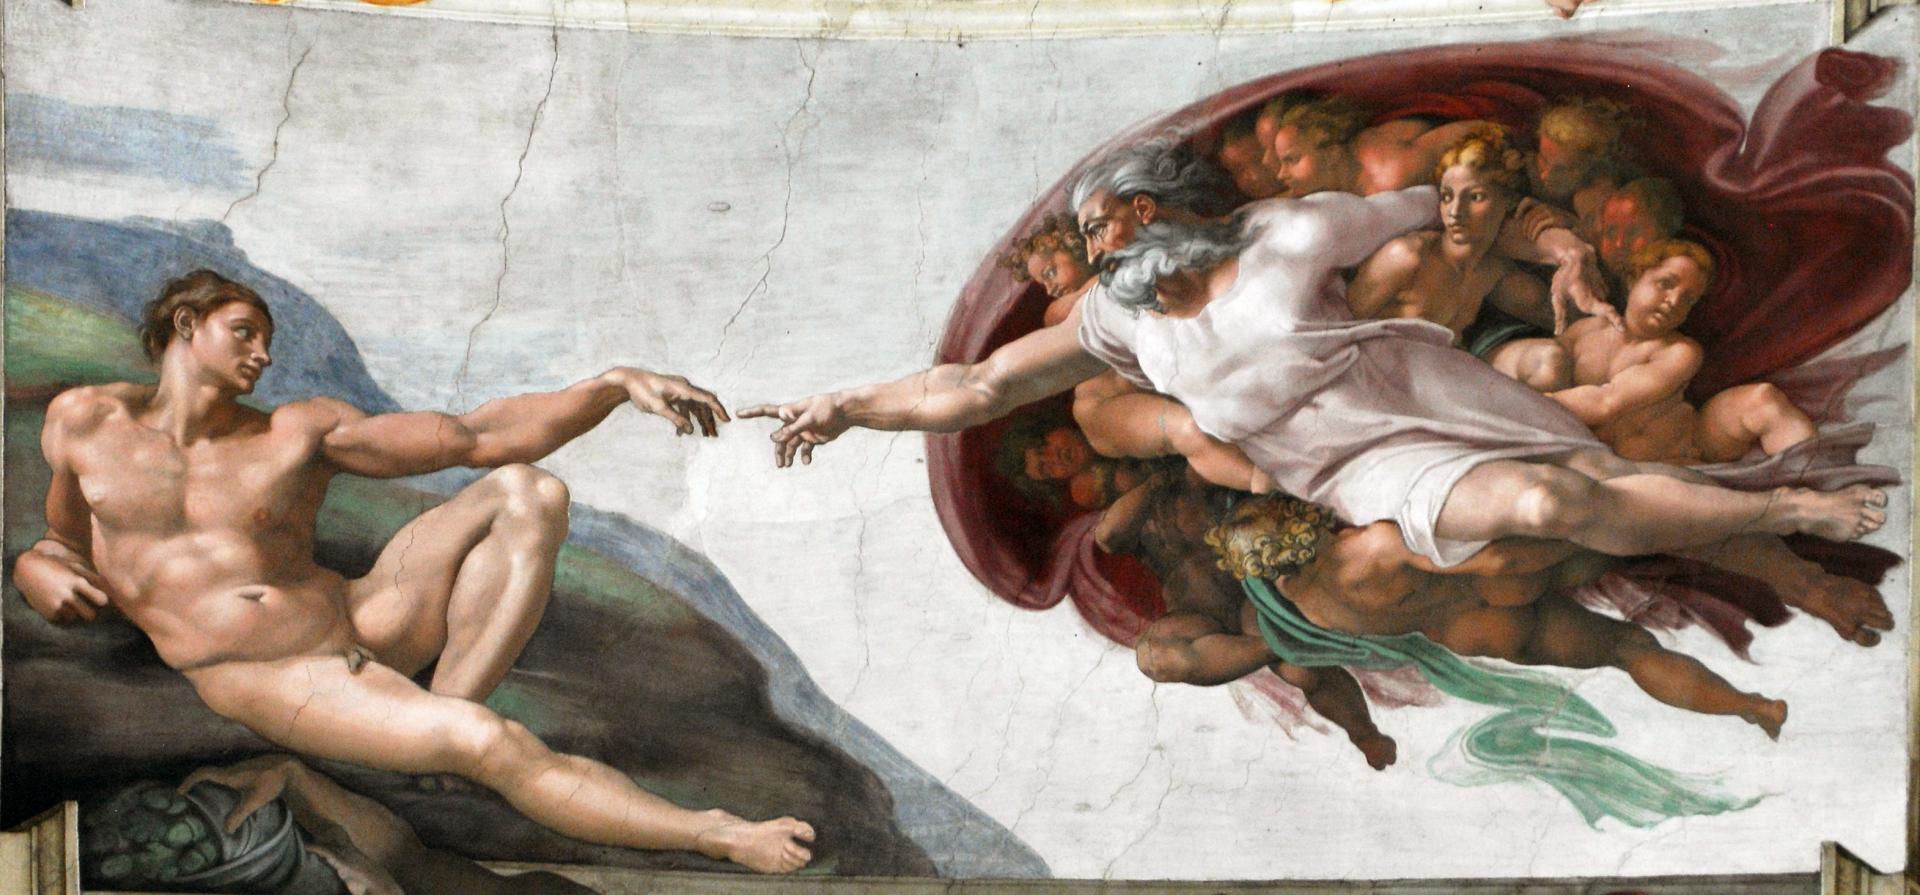 Микеланджело Буонарроти. Сотворение Адама. 1511